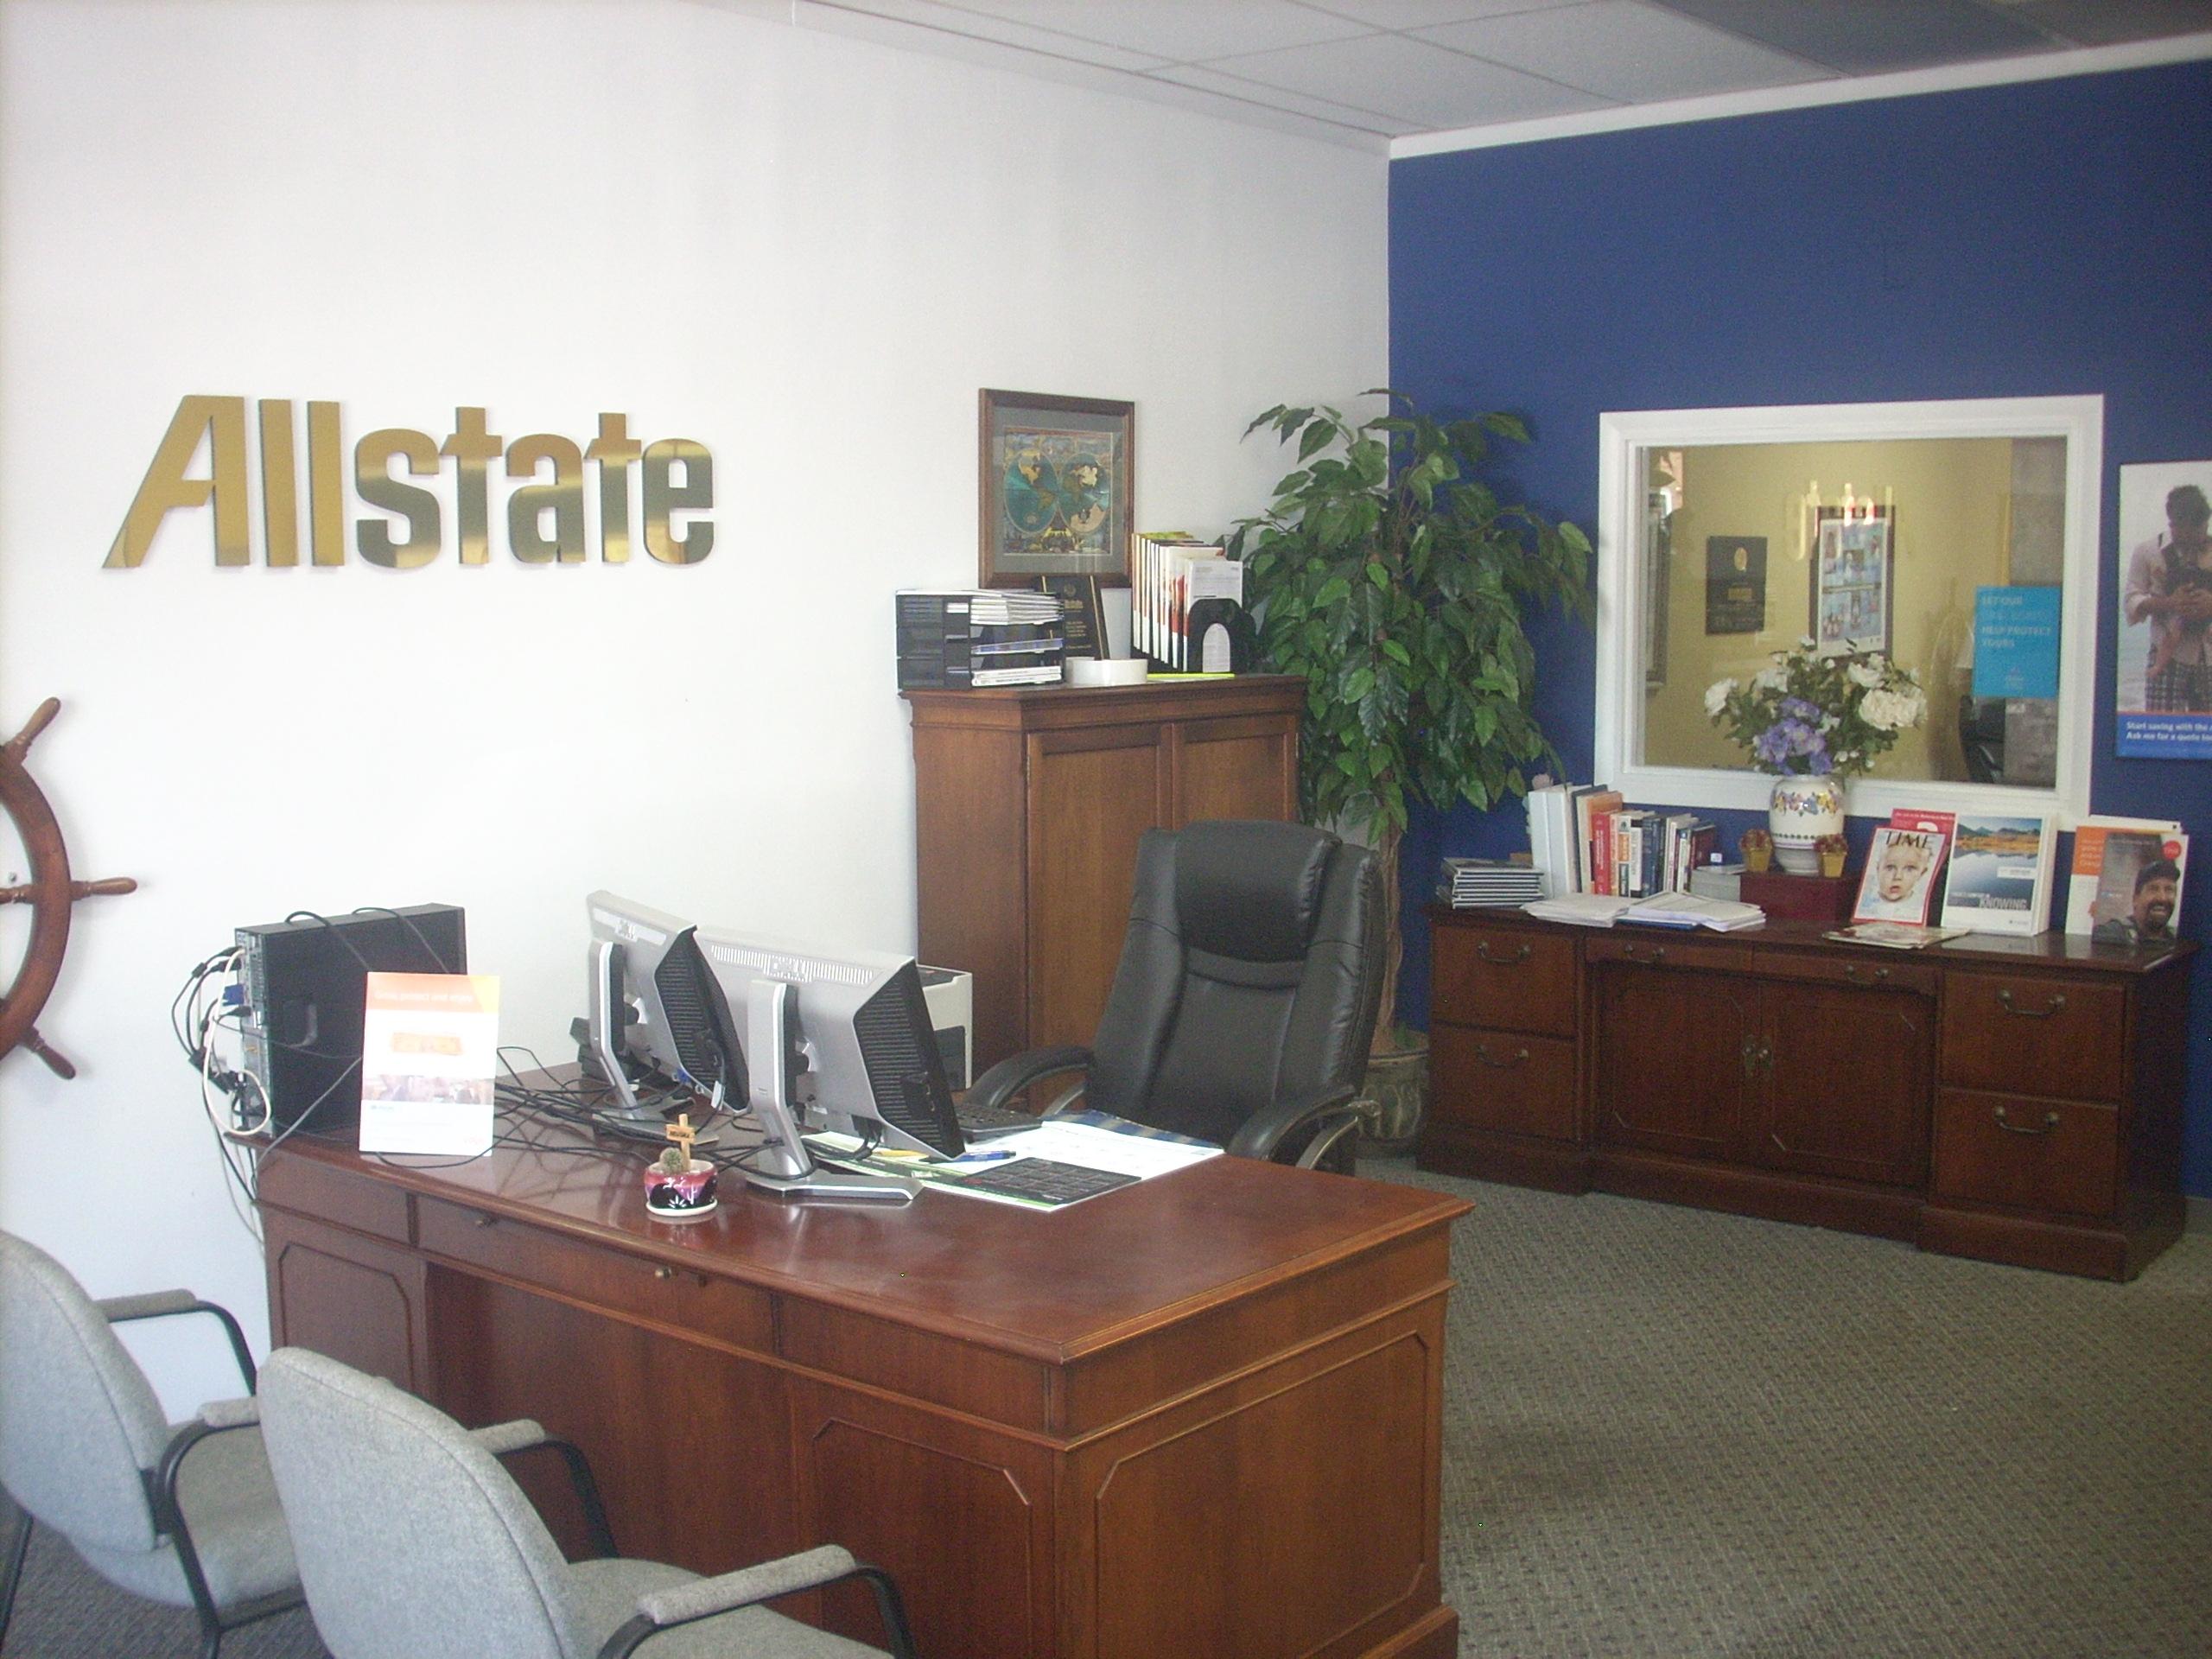 Allstate Insurance Agent: Bill Mason image 3